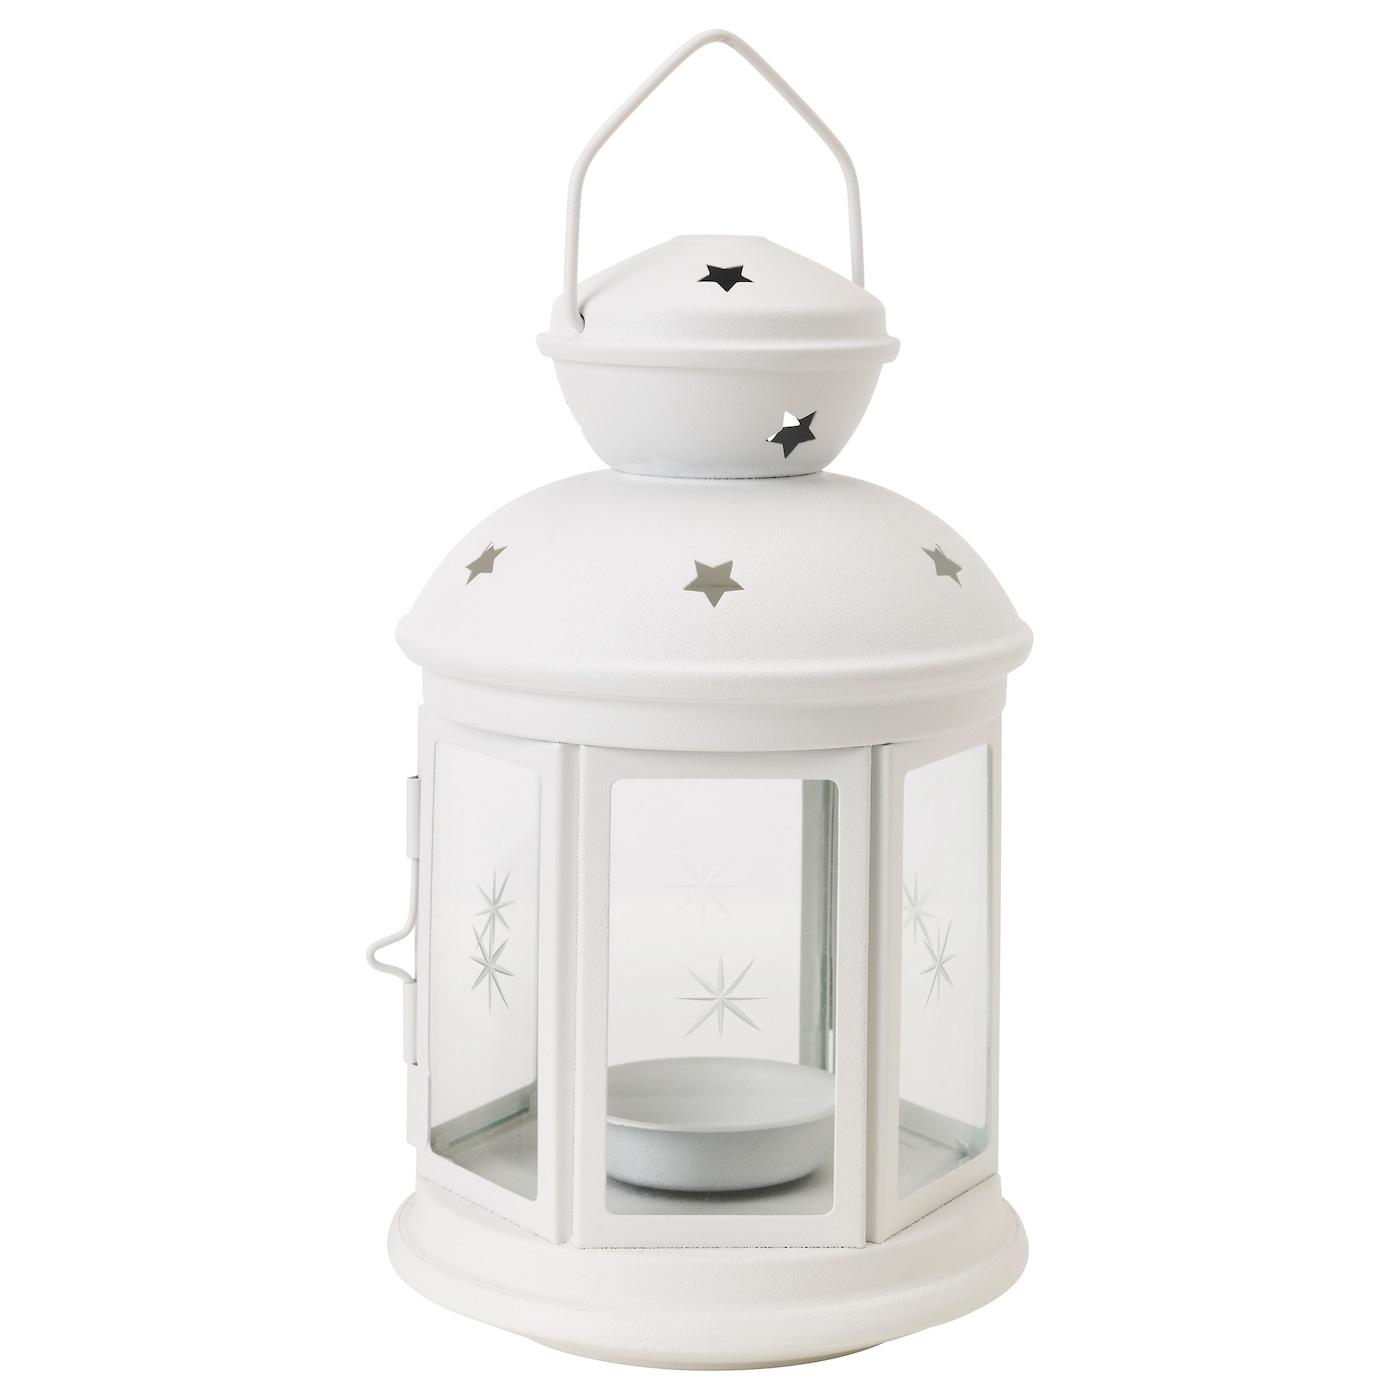 Ikea white lanterns chapin 63985 4-gallon backpack sprayer